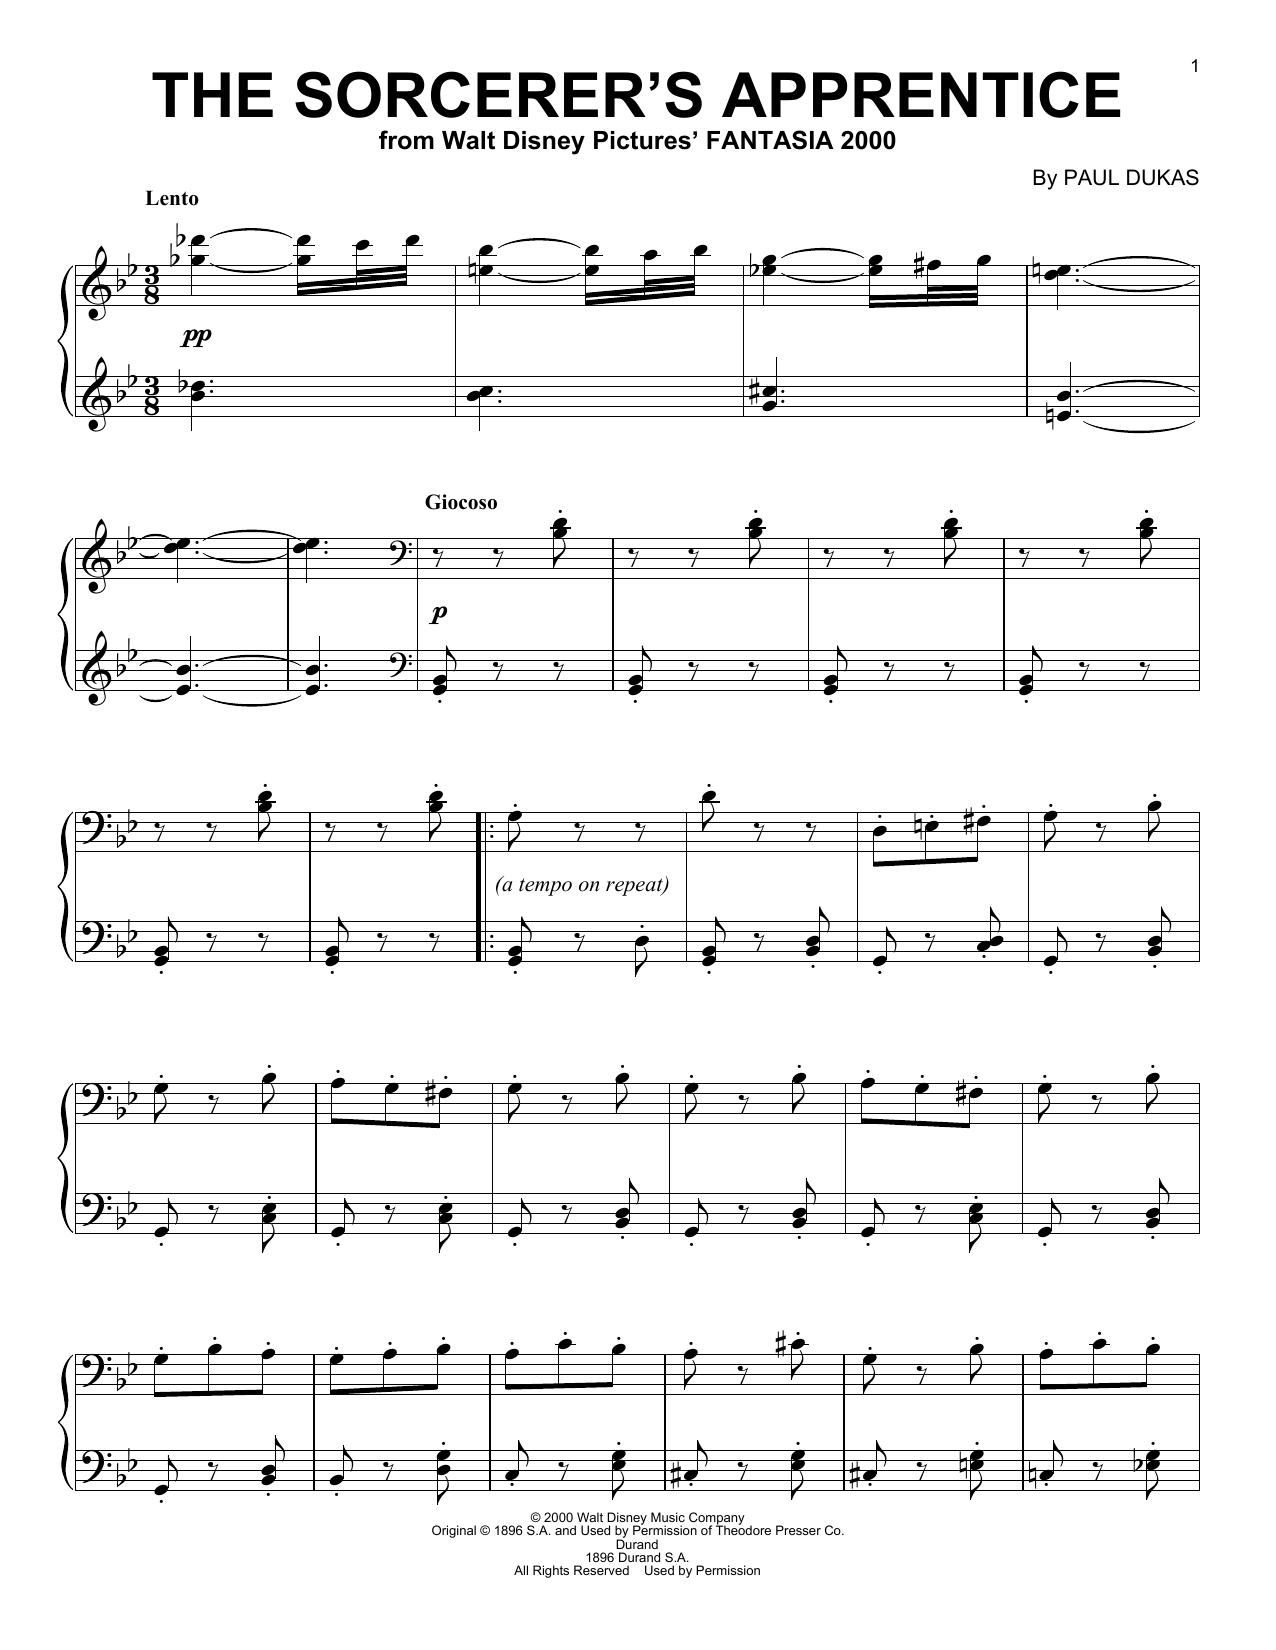 The Sorcerer's Apprentice sheet music